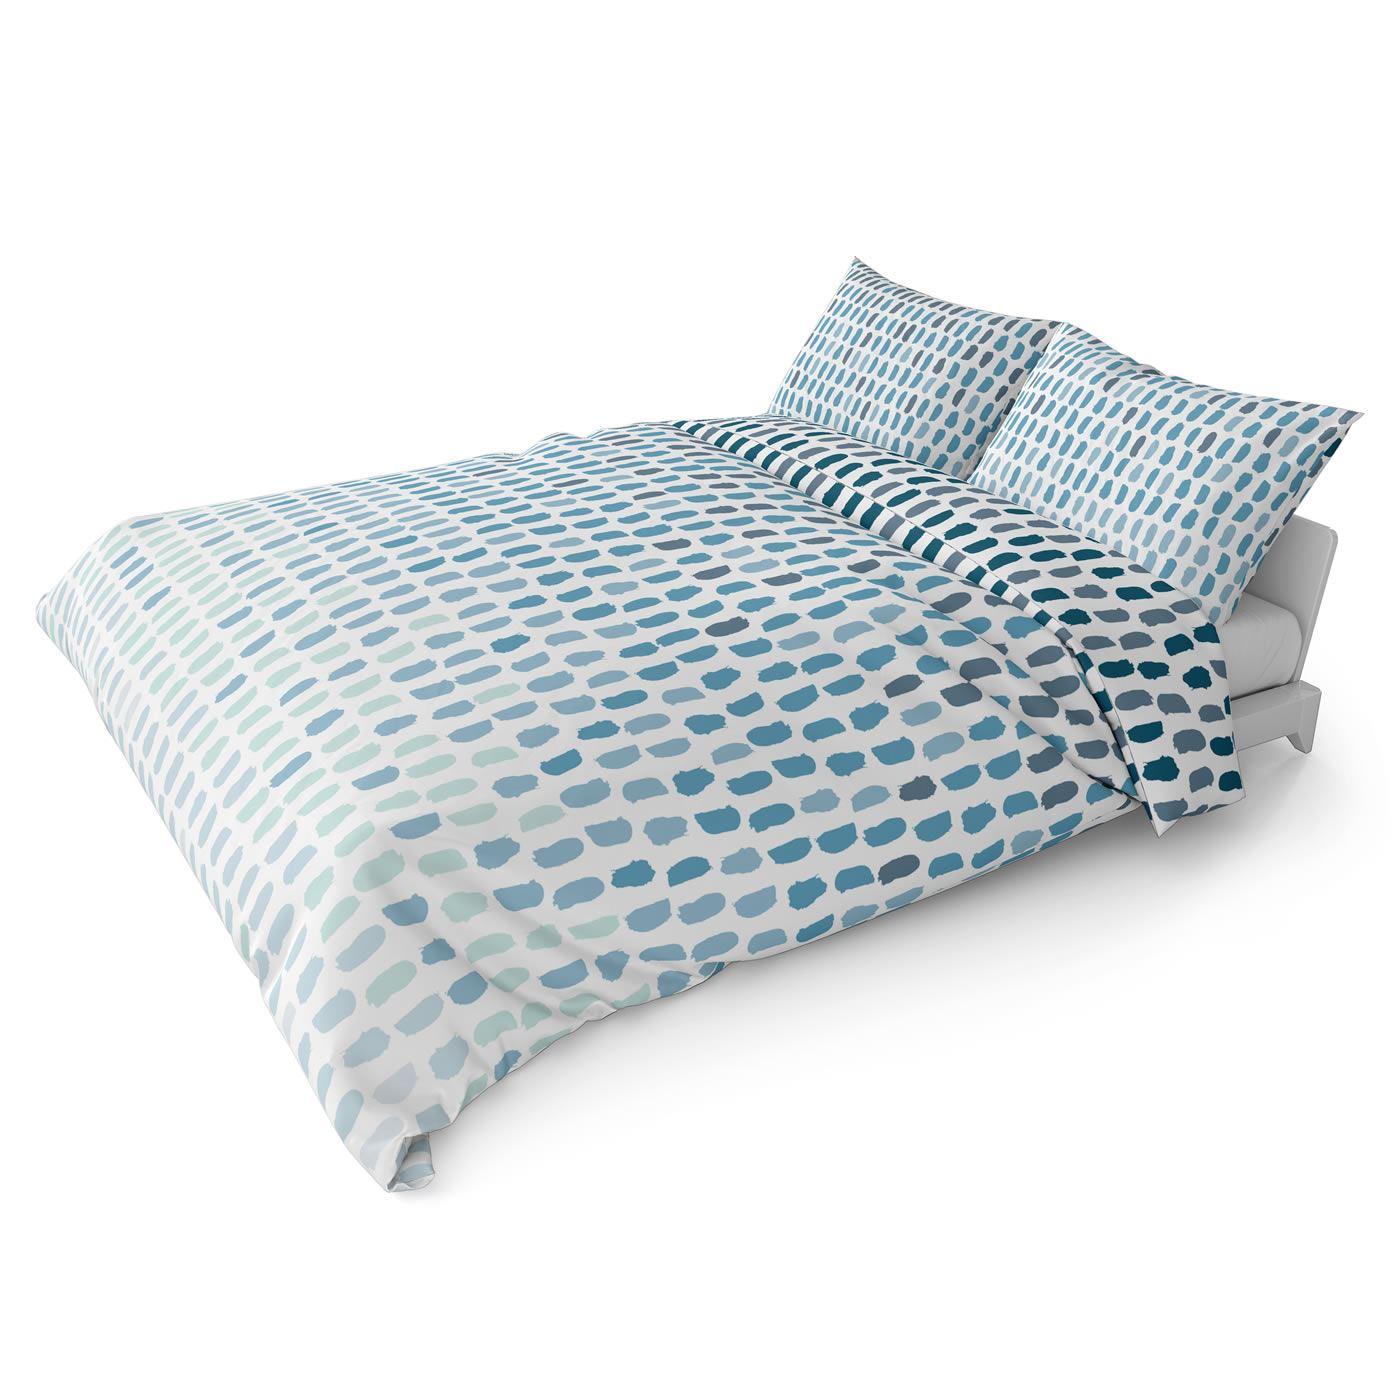 Funda-nordica-azul-azul-marino-verde-azulado-edredon-algodon-estampado-juego-conjuntos-de-cama-cubre miniatura 57